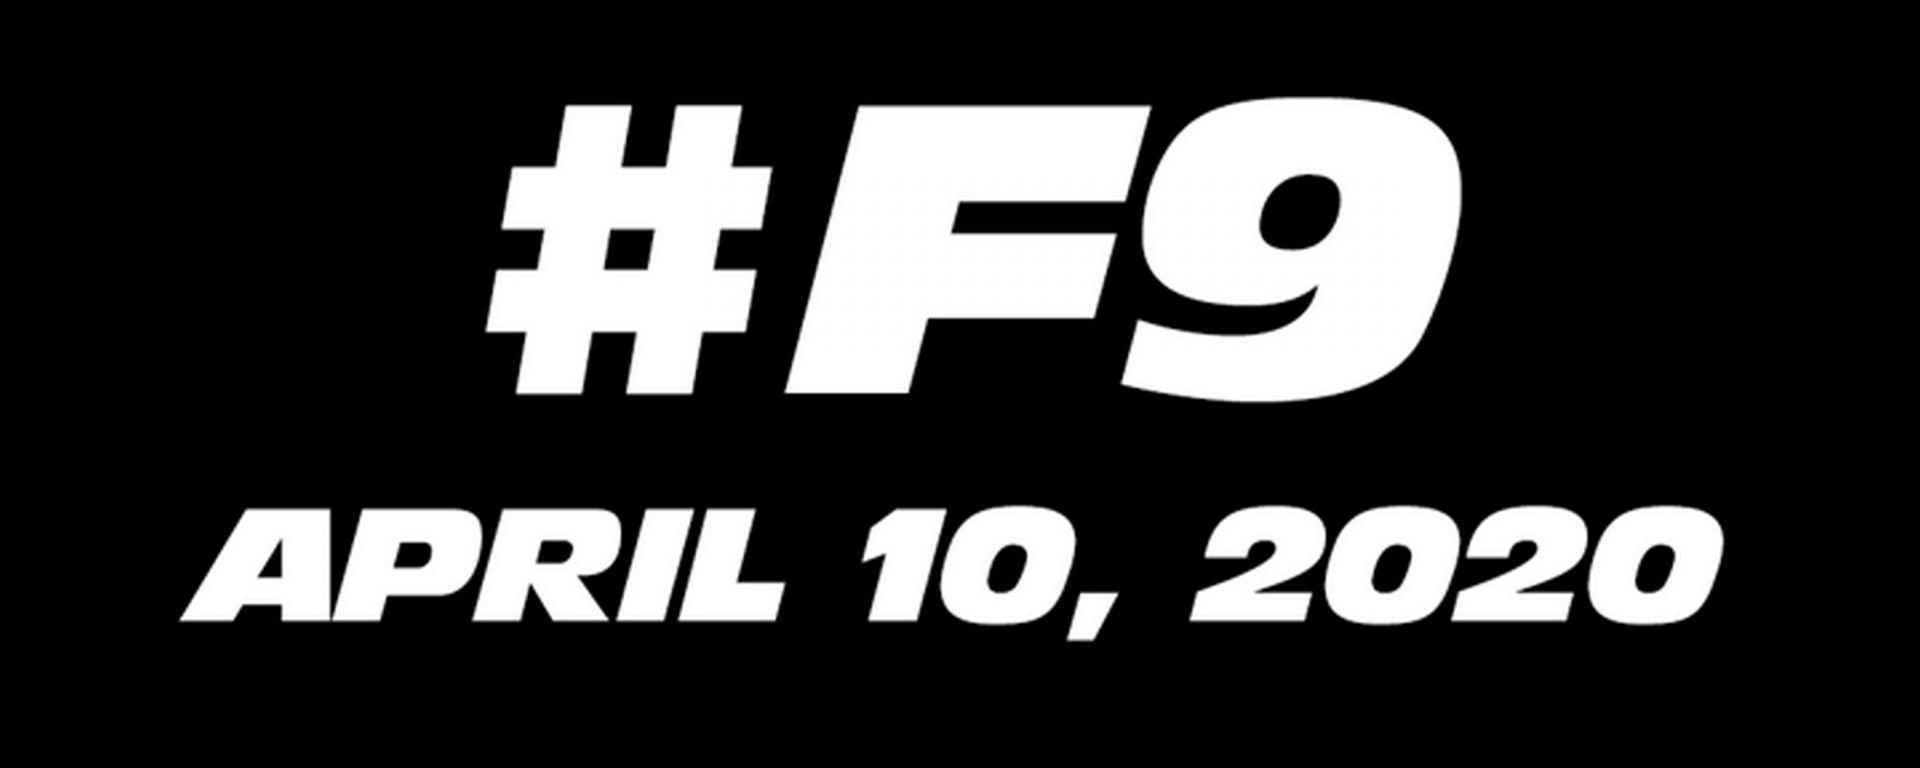 Fast and Furious 9: la Universal posticipa l'uscita al 2020